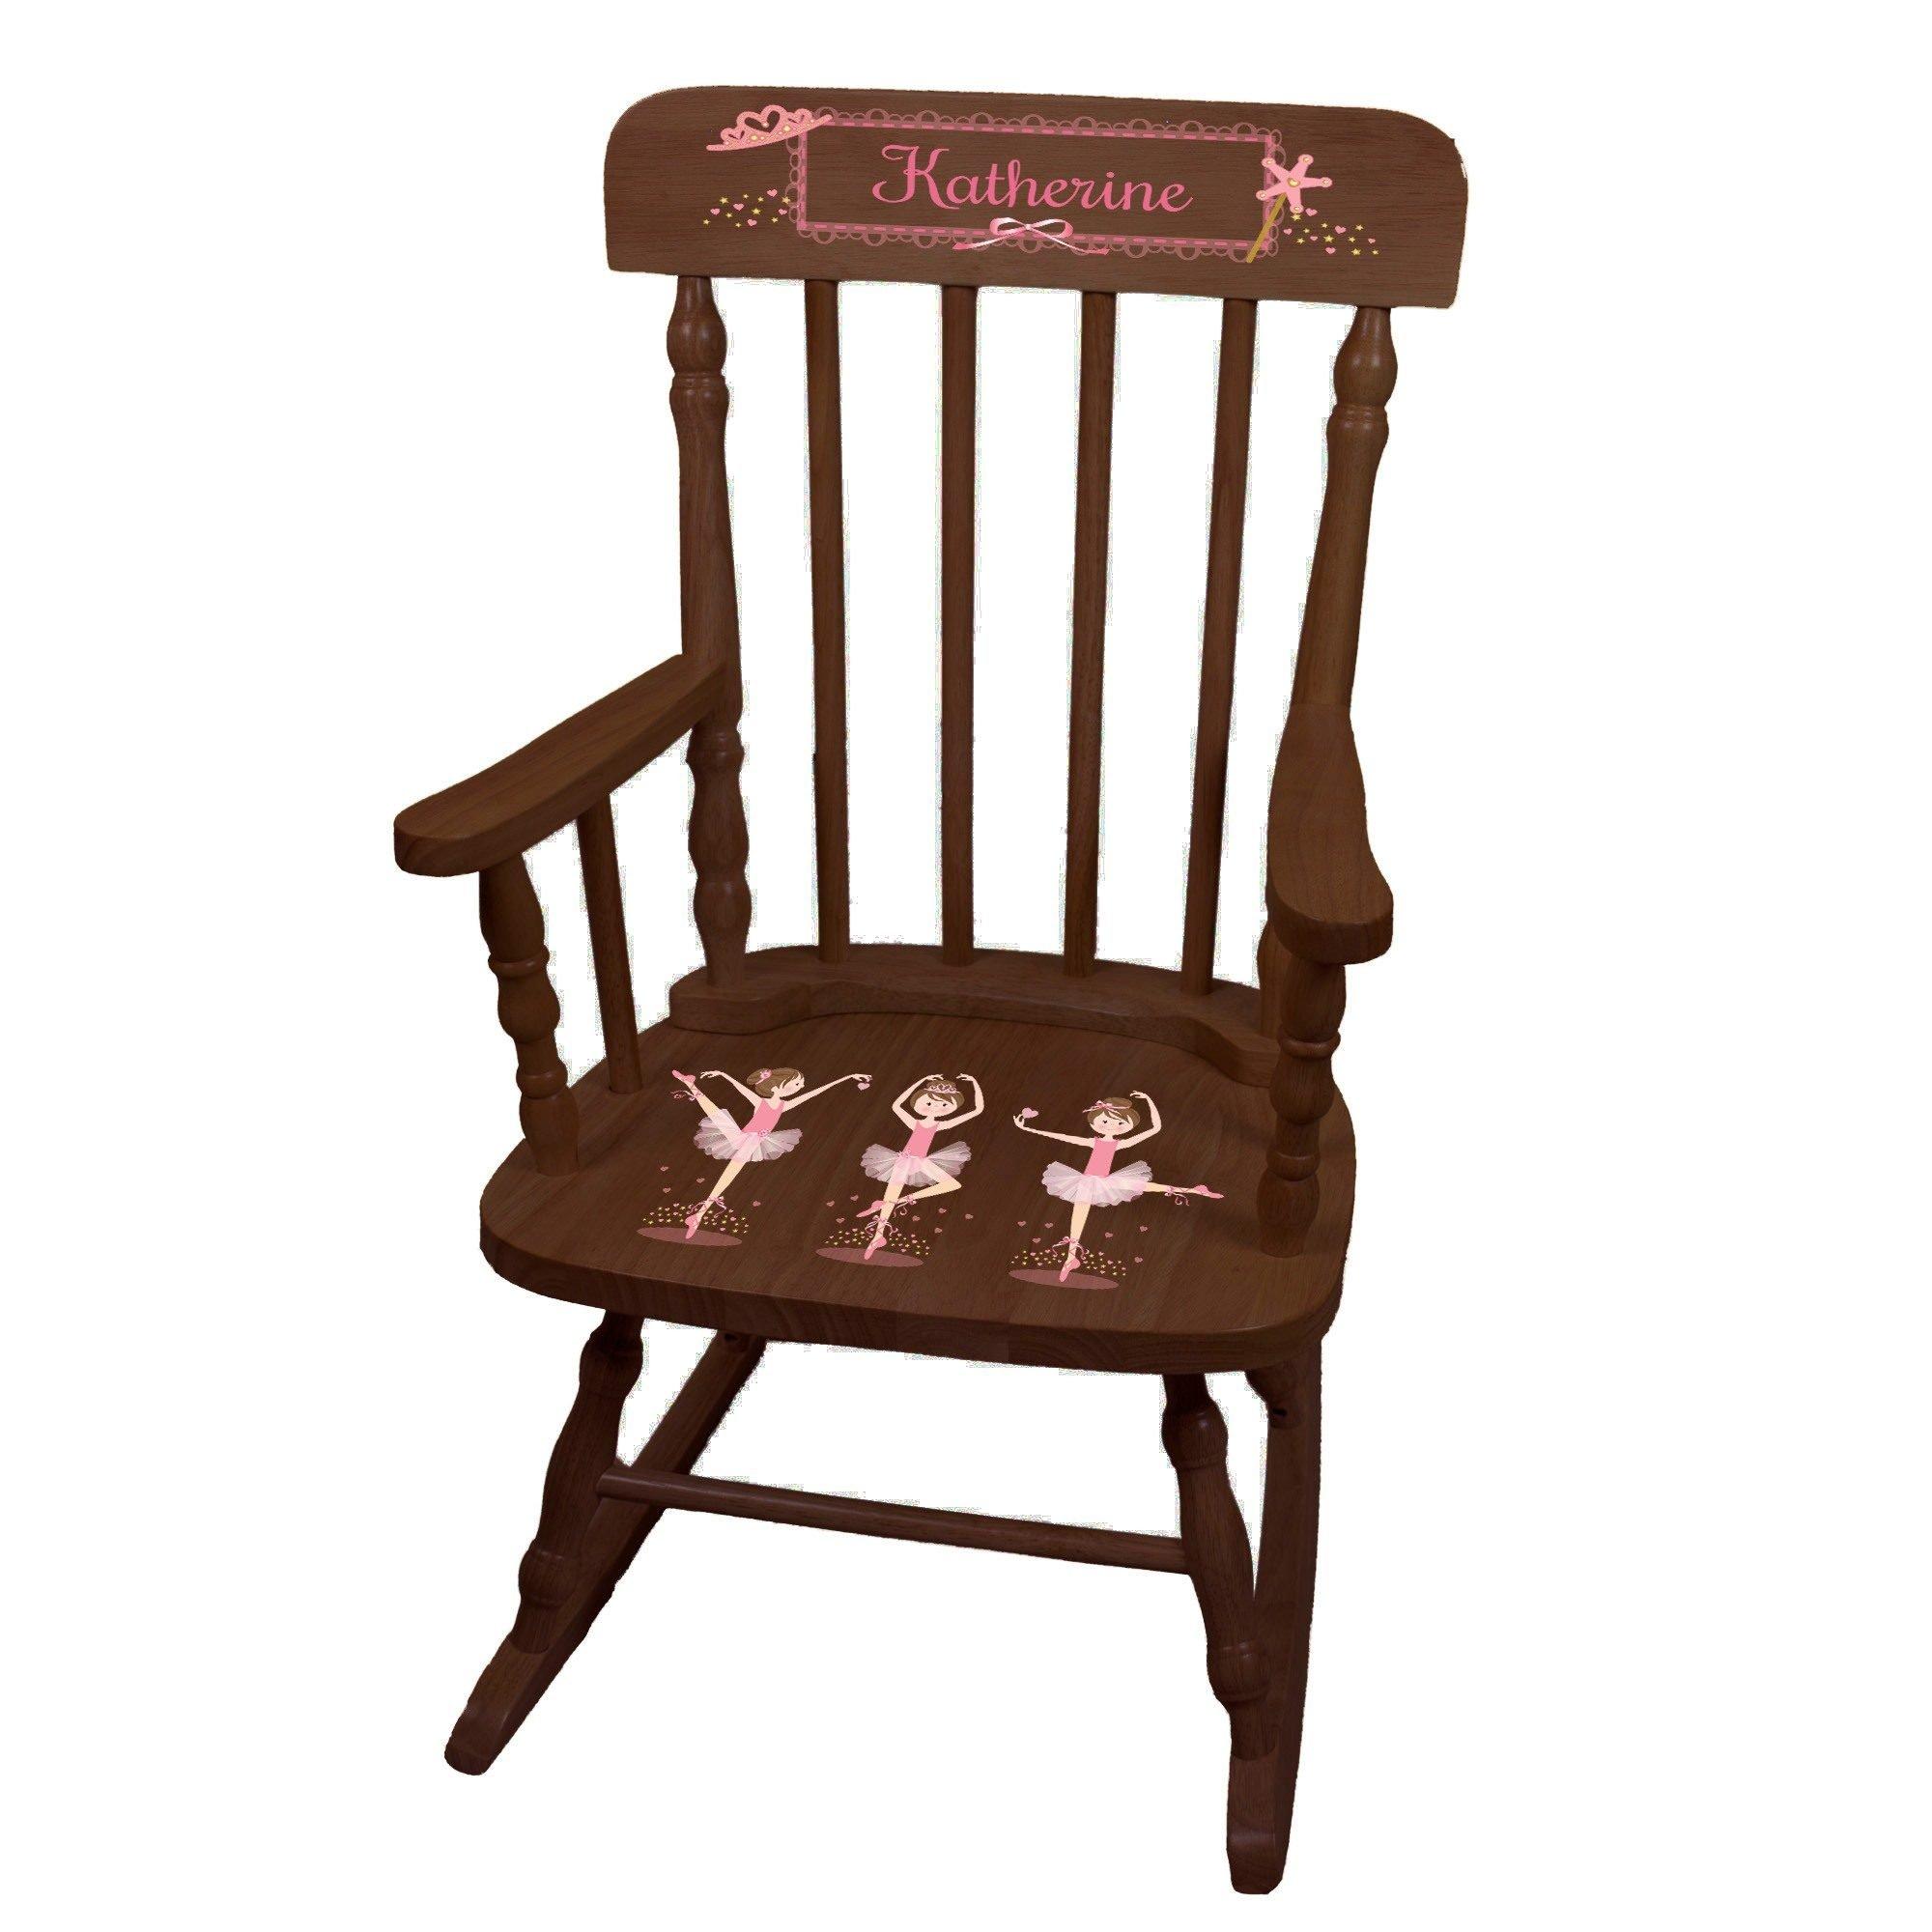 MyBambino Personalized Ballerina brunette Espresso Childrens Rocking Chair